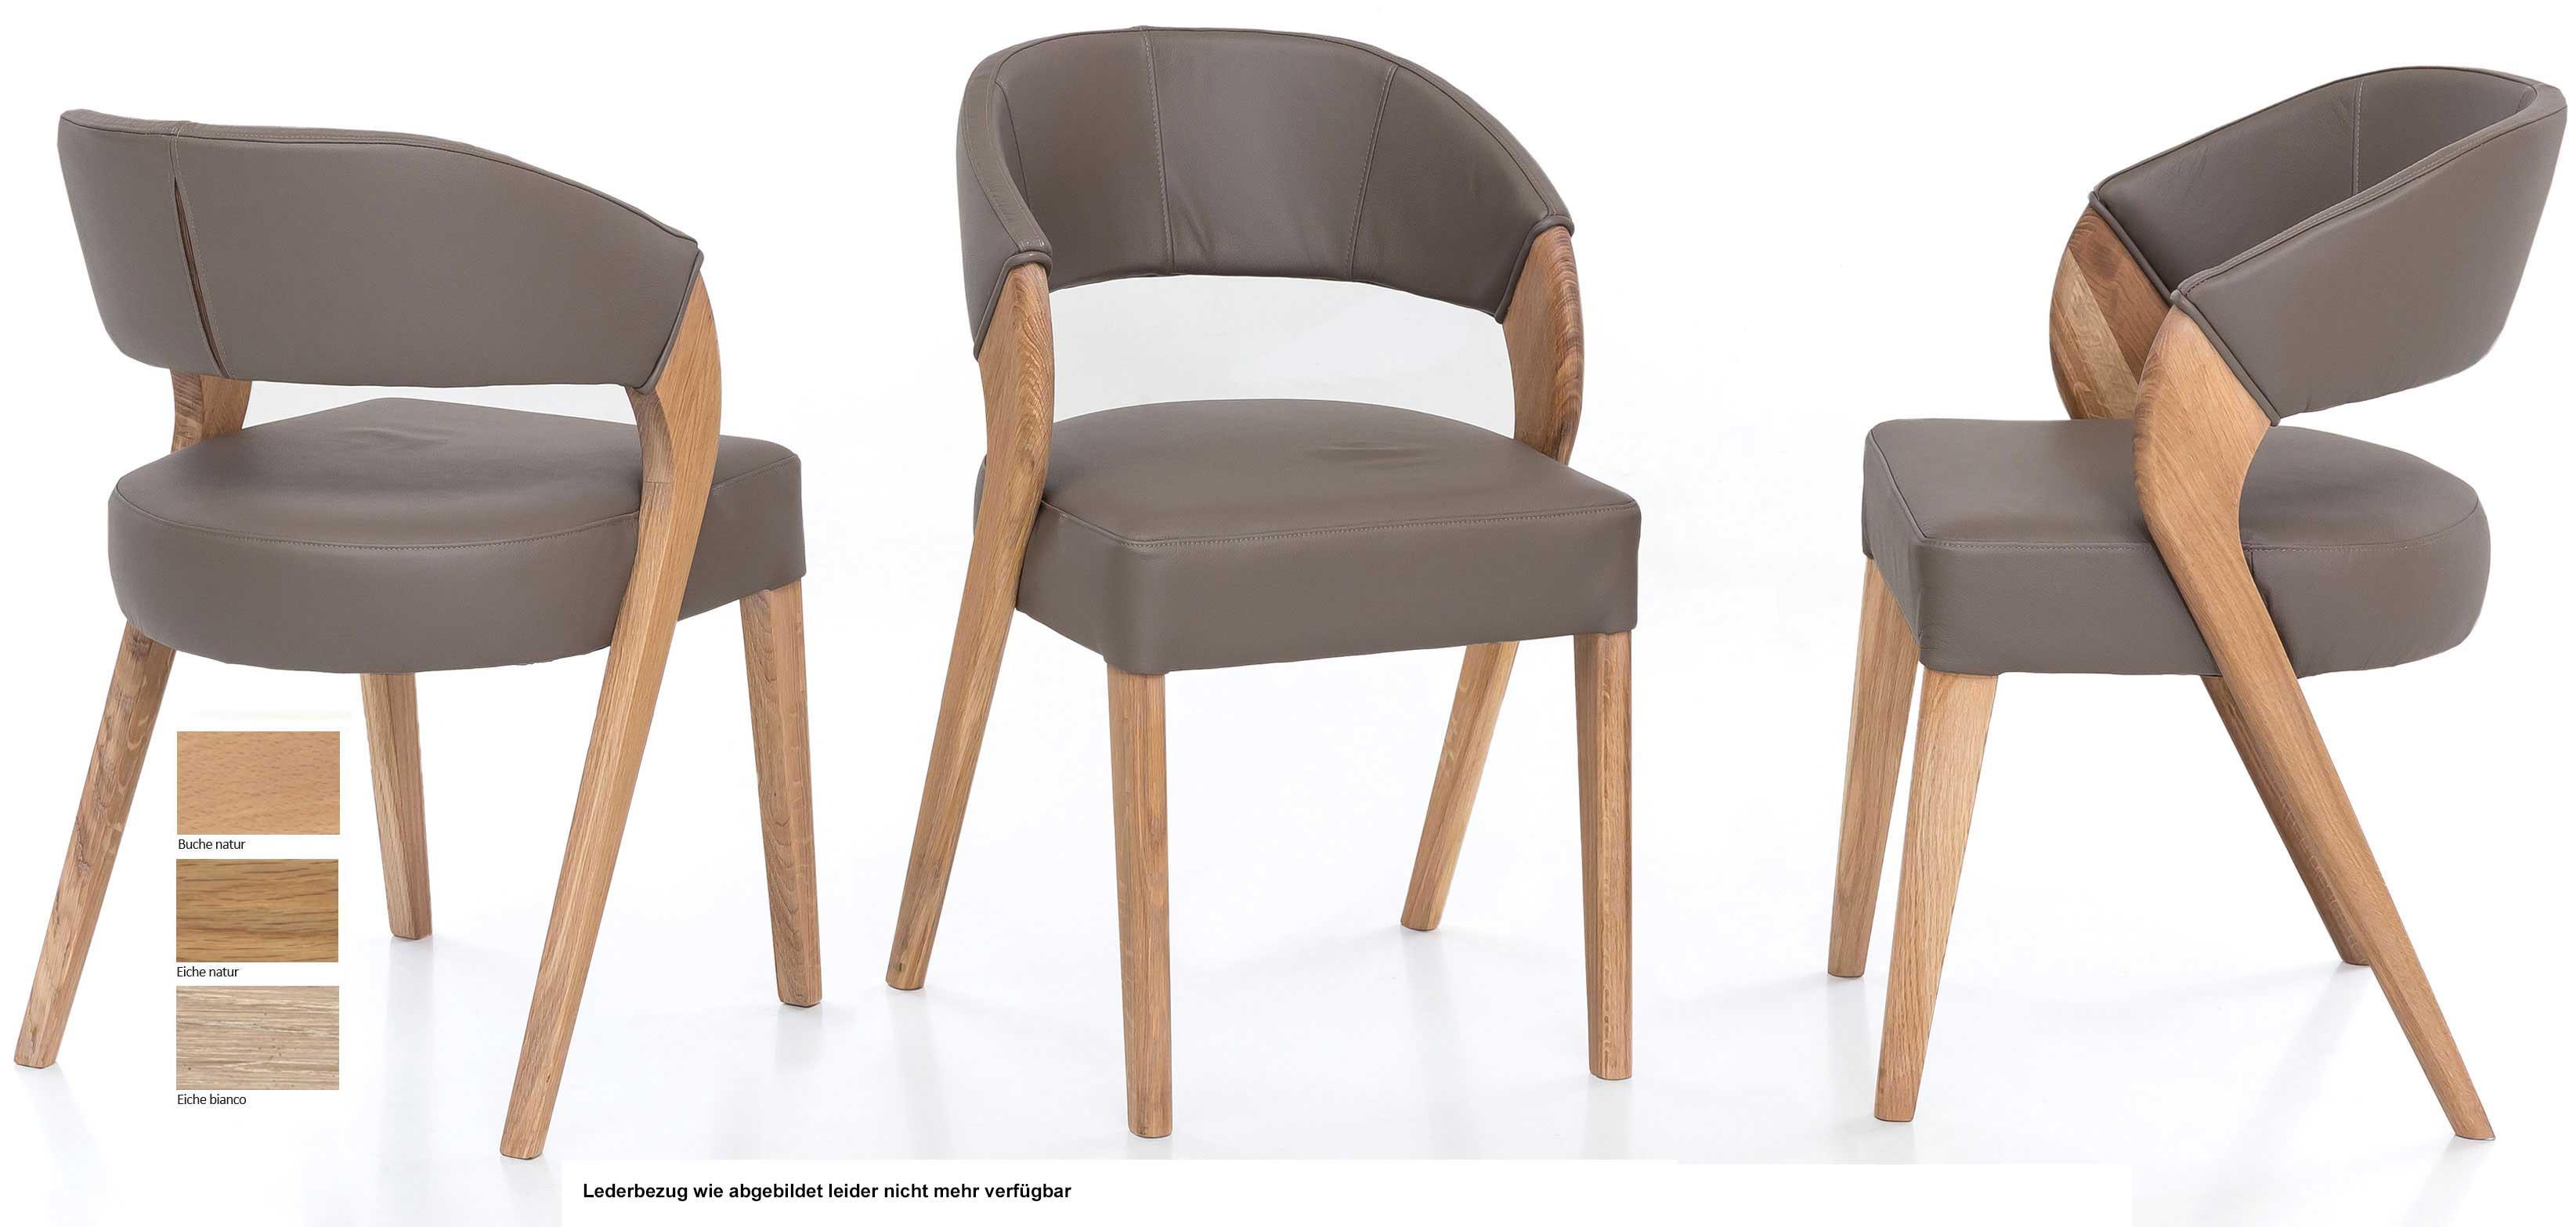 Standard Furniture Almada Cocktailsessel massiv eiche